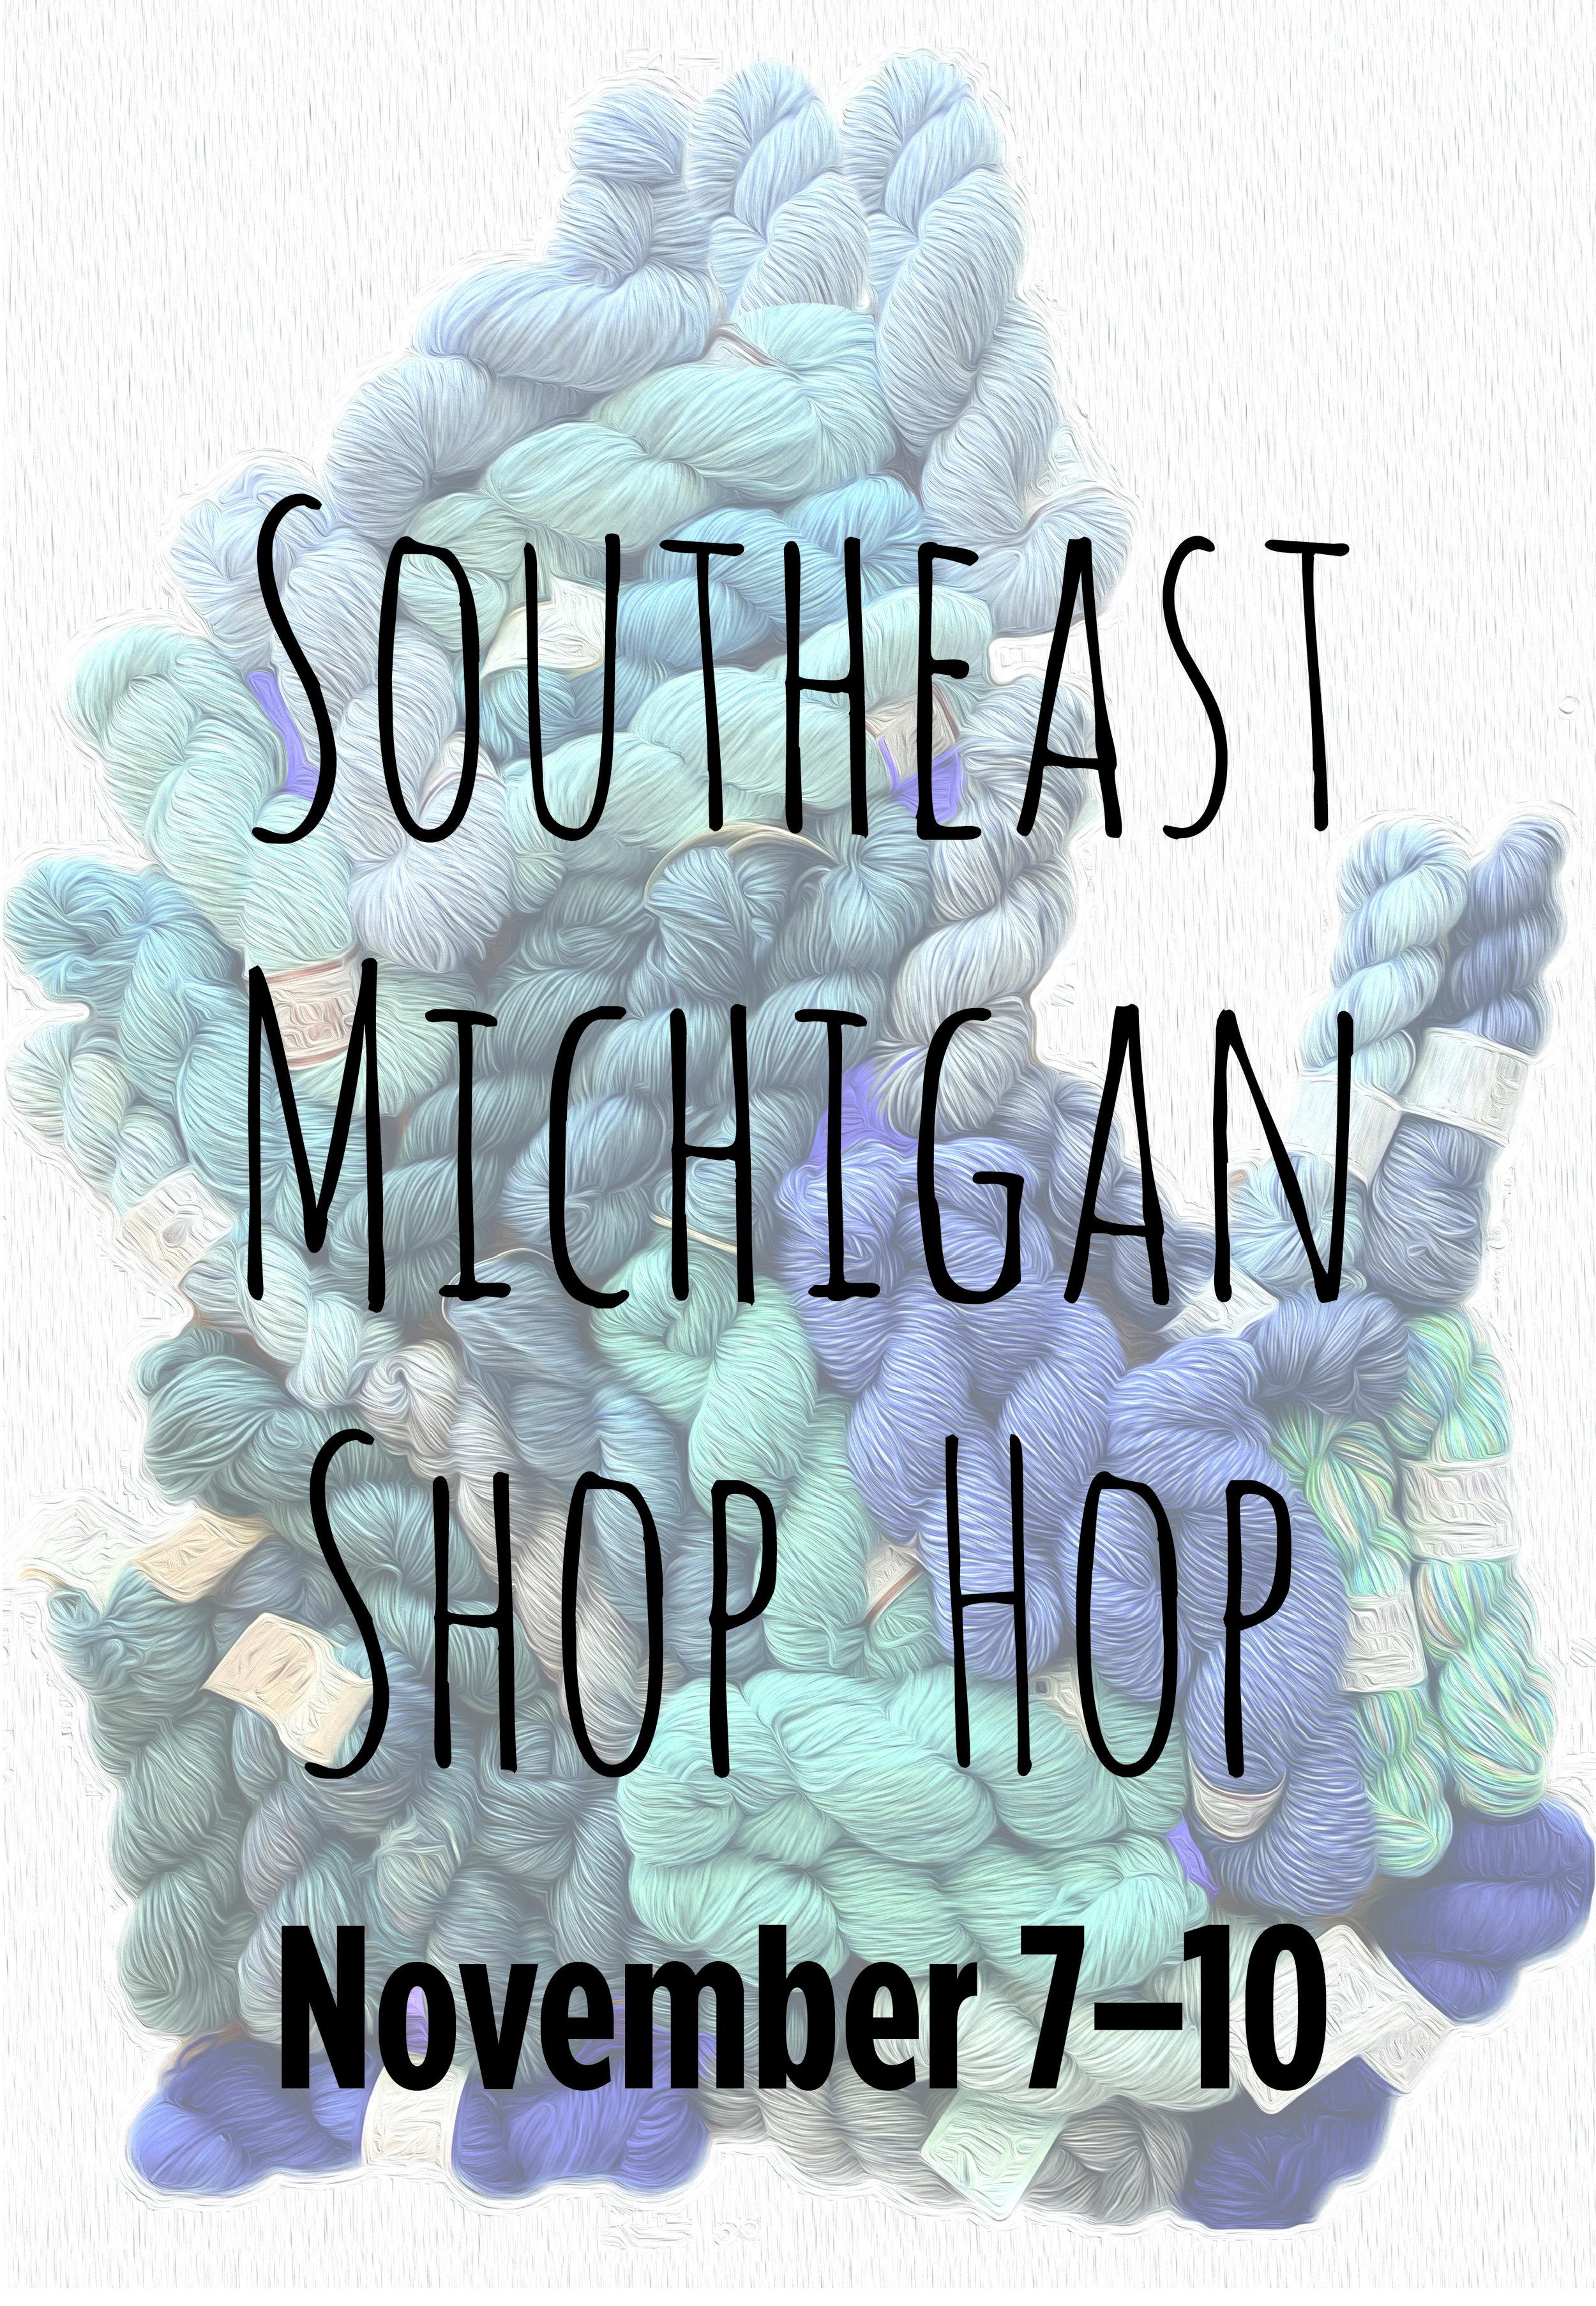 Southeast Michigan Yarn Hop Graphic.jpg